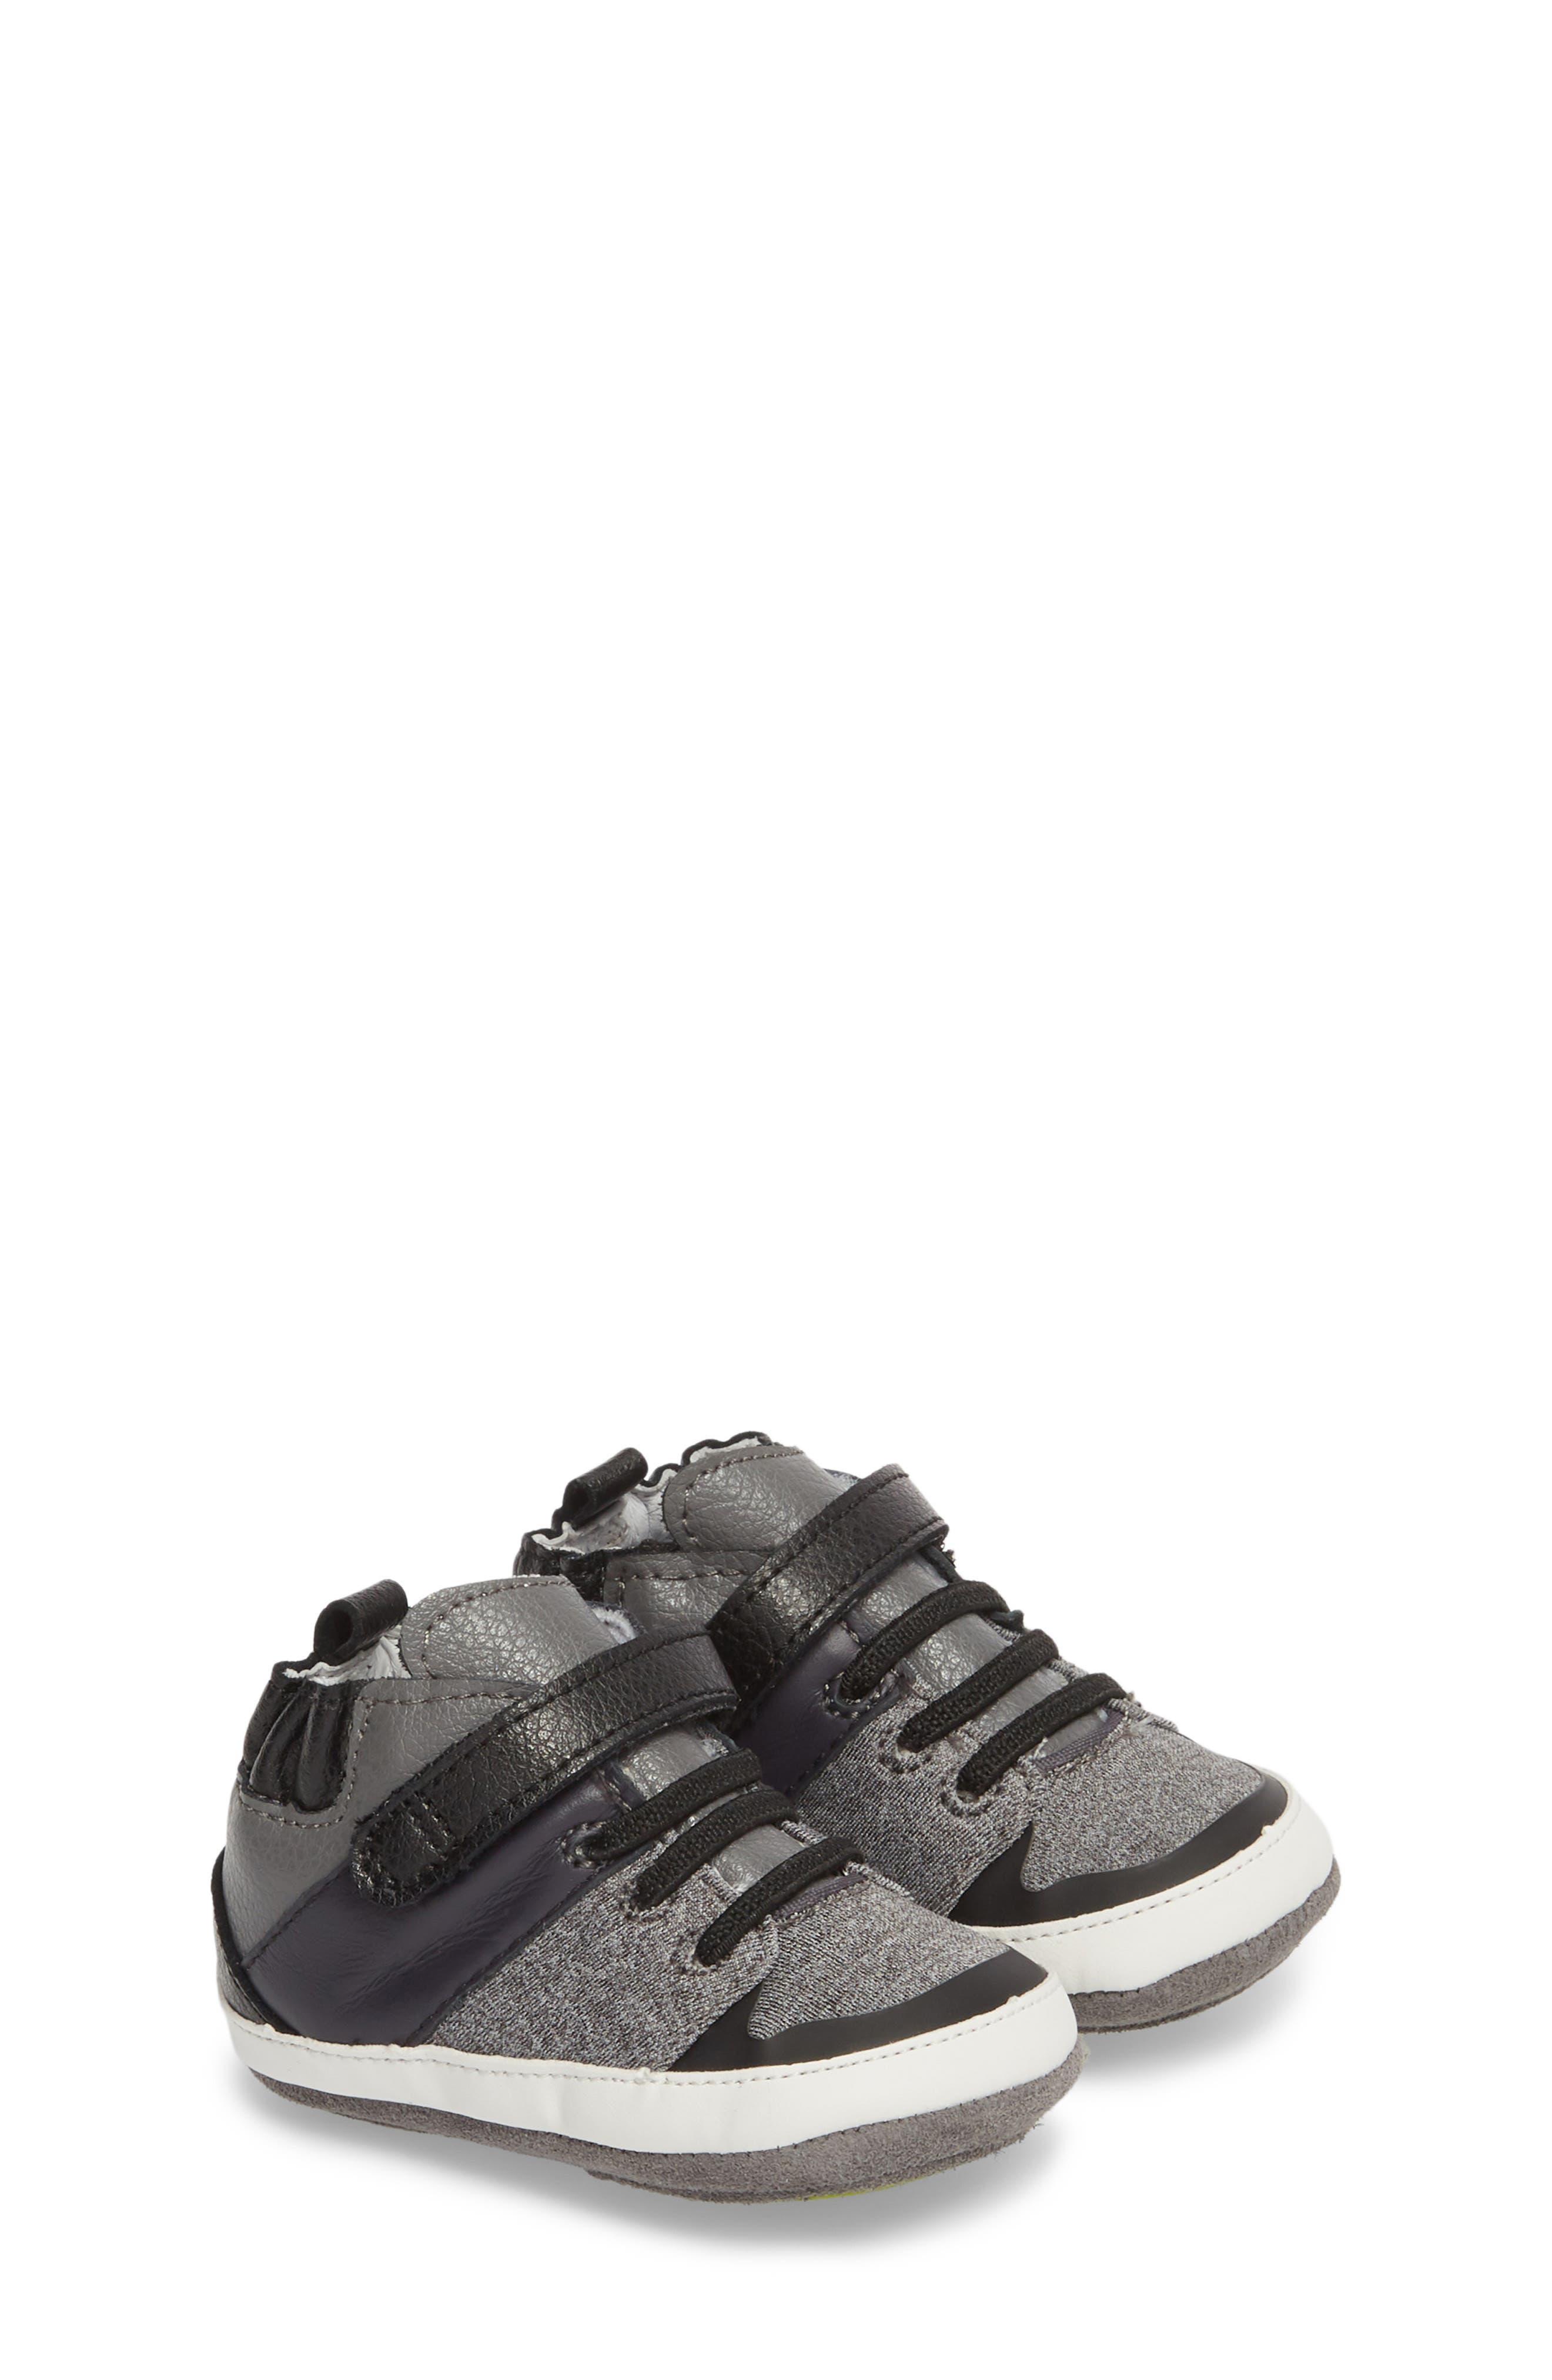 Alternate Image 3  - Robeez® Zachary High Top Crib Sneaker (Baby & Walker)